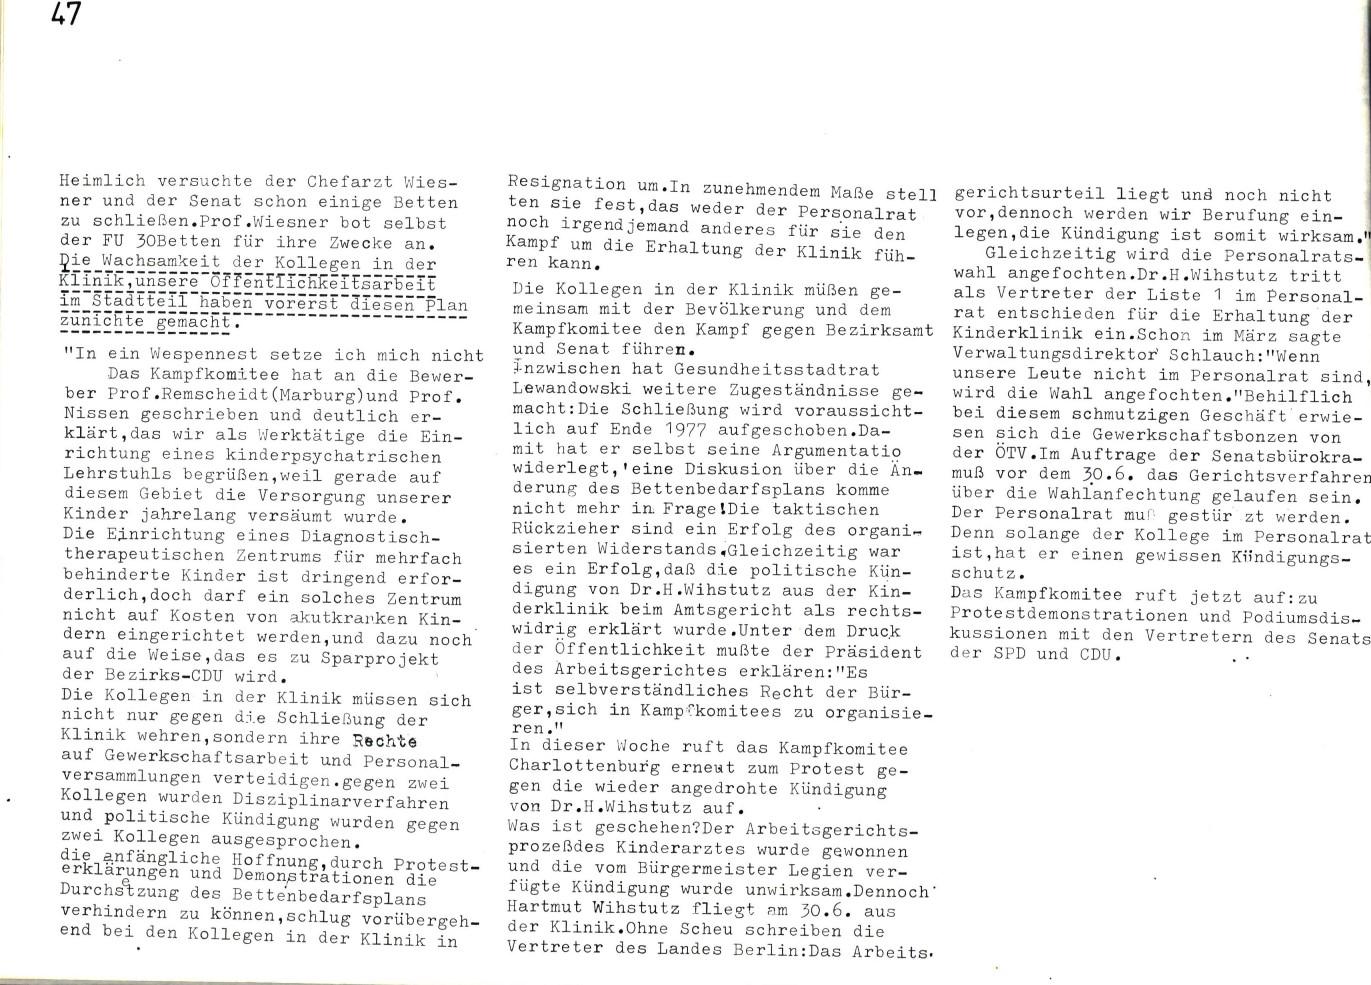 Berlin_KSV_1974_Rote_Bauwochen_64